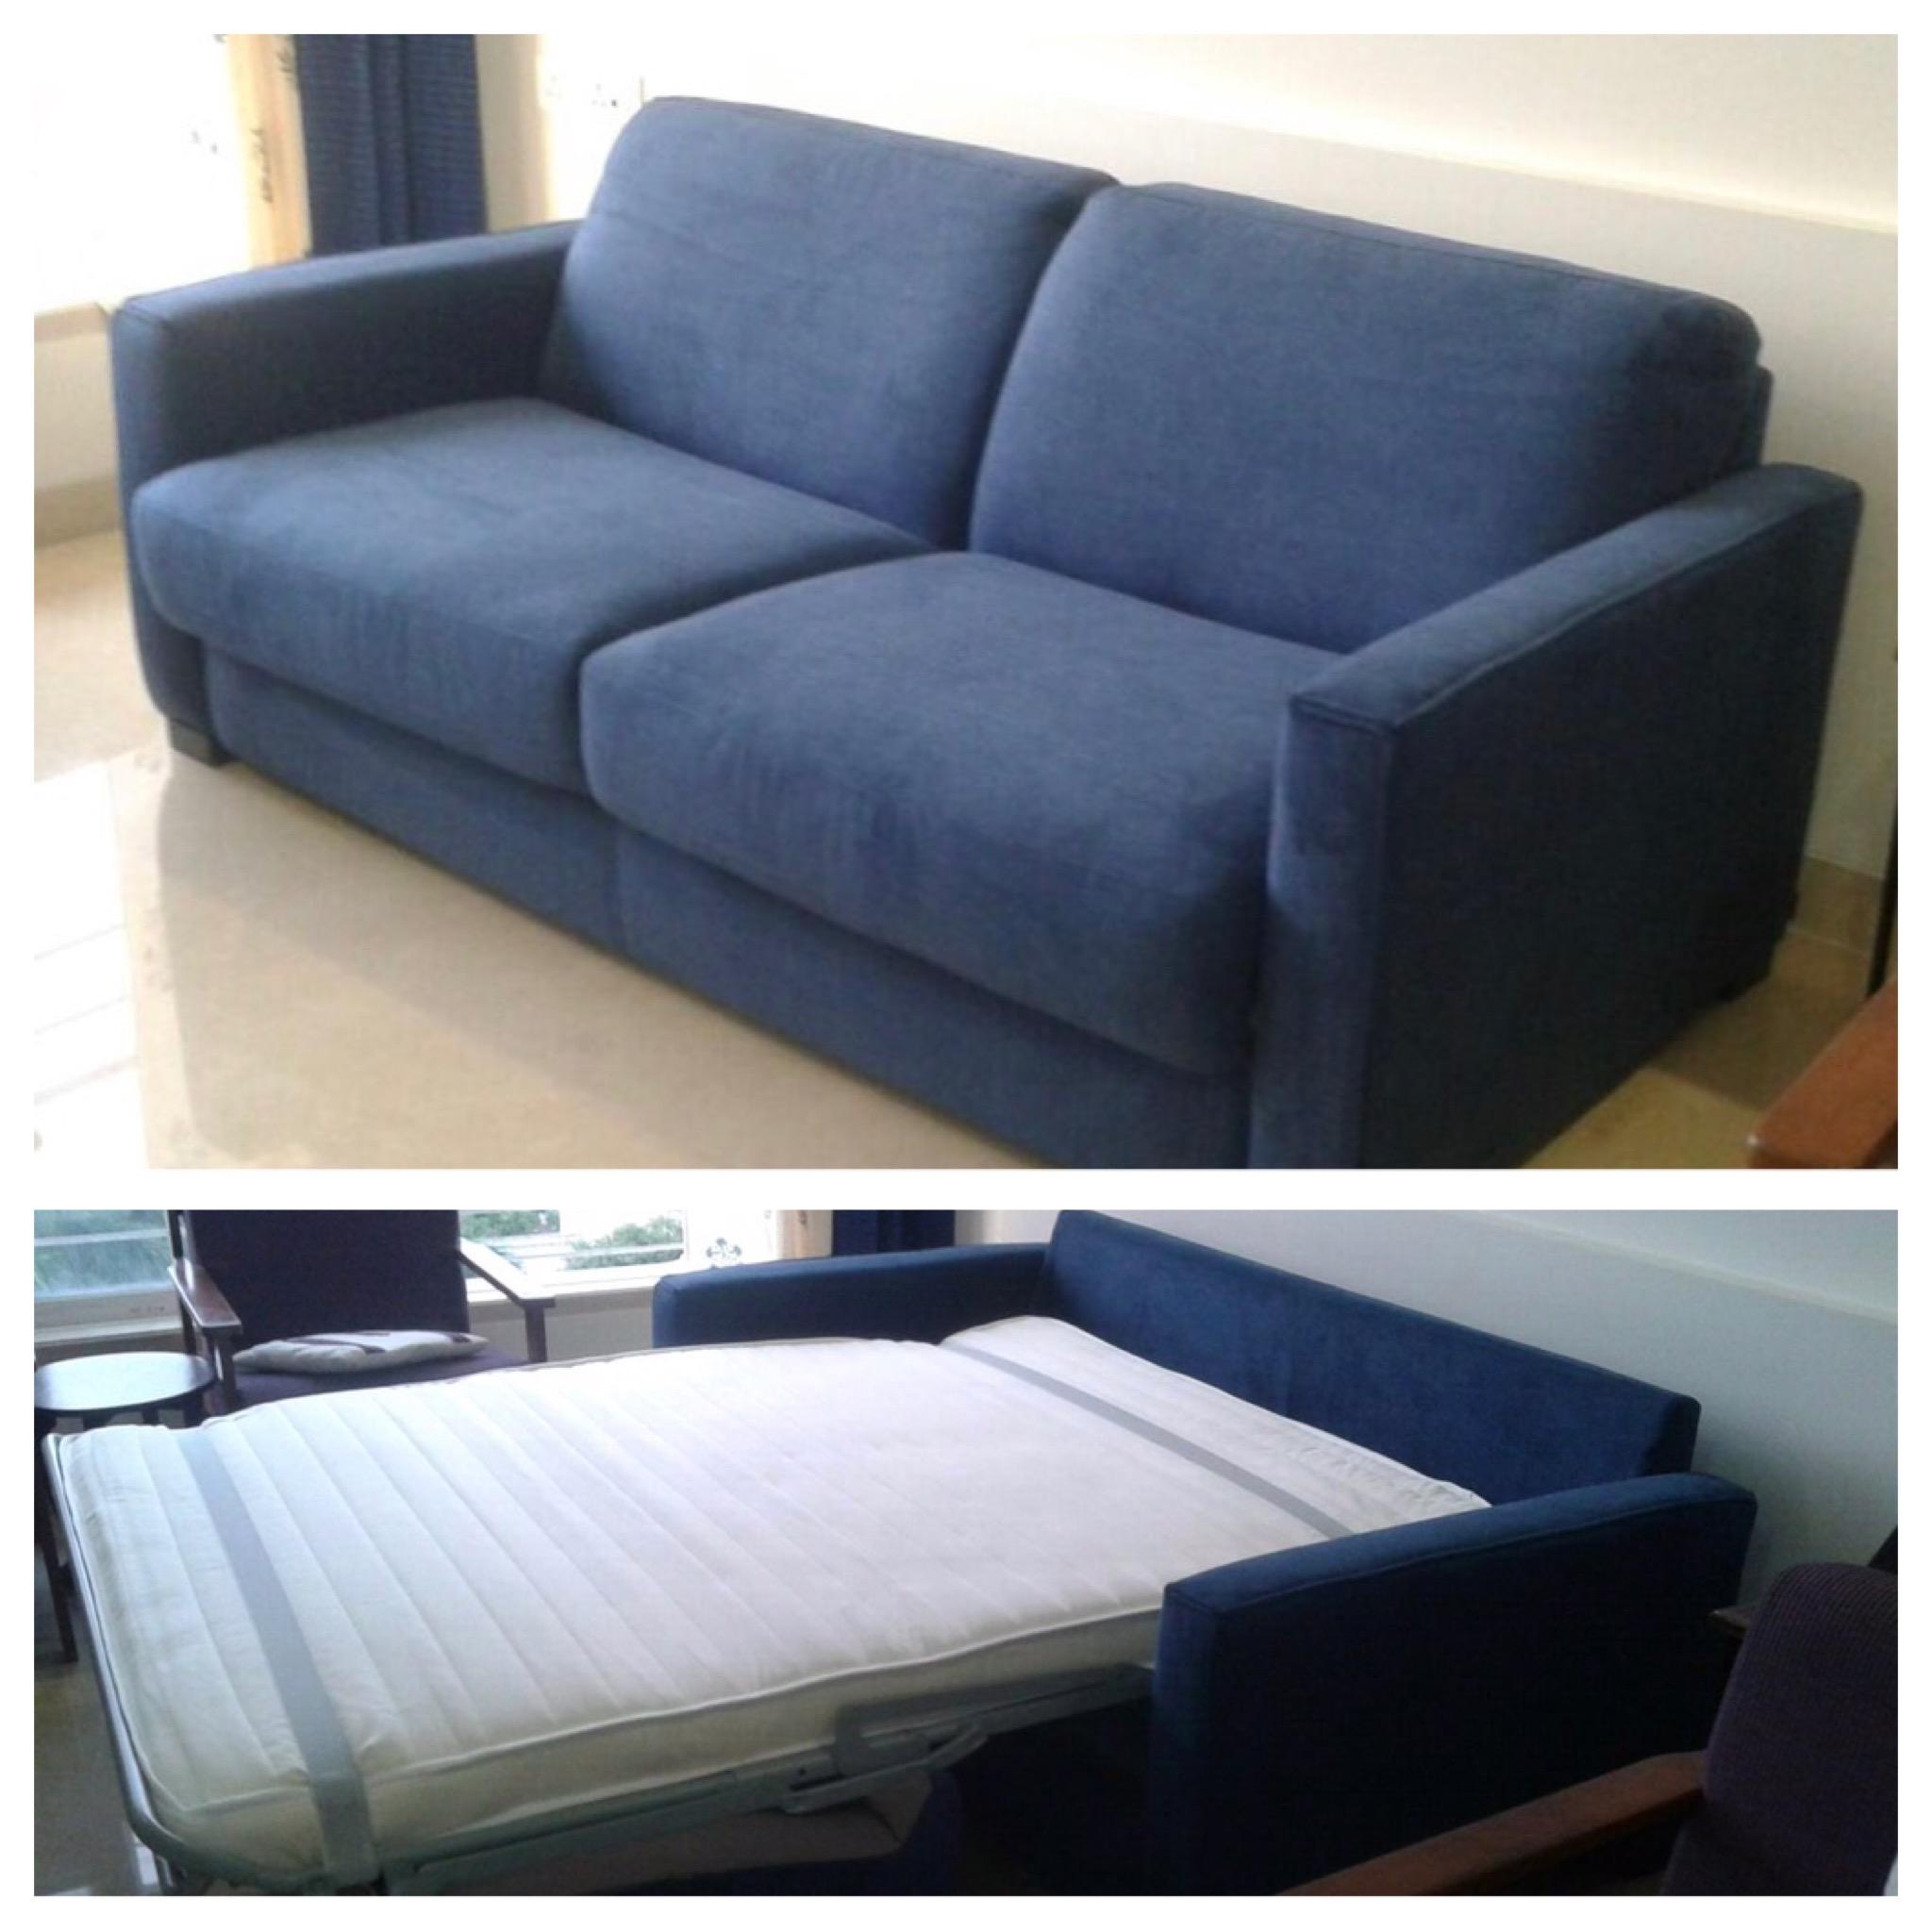 The Couch Potato Sofa Sofa Set